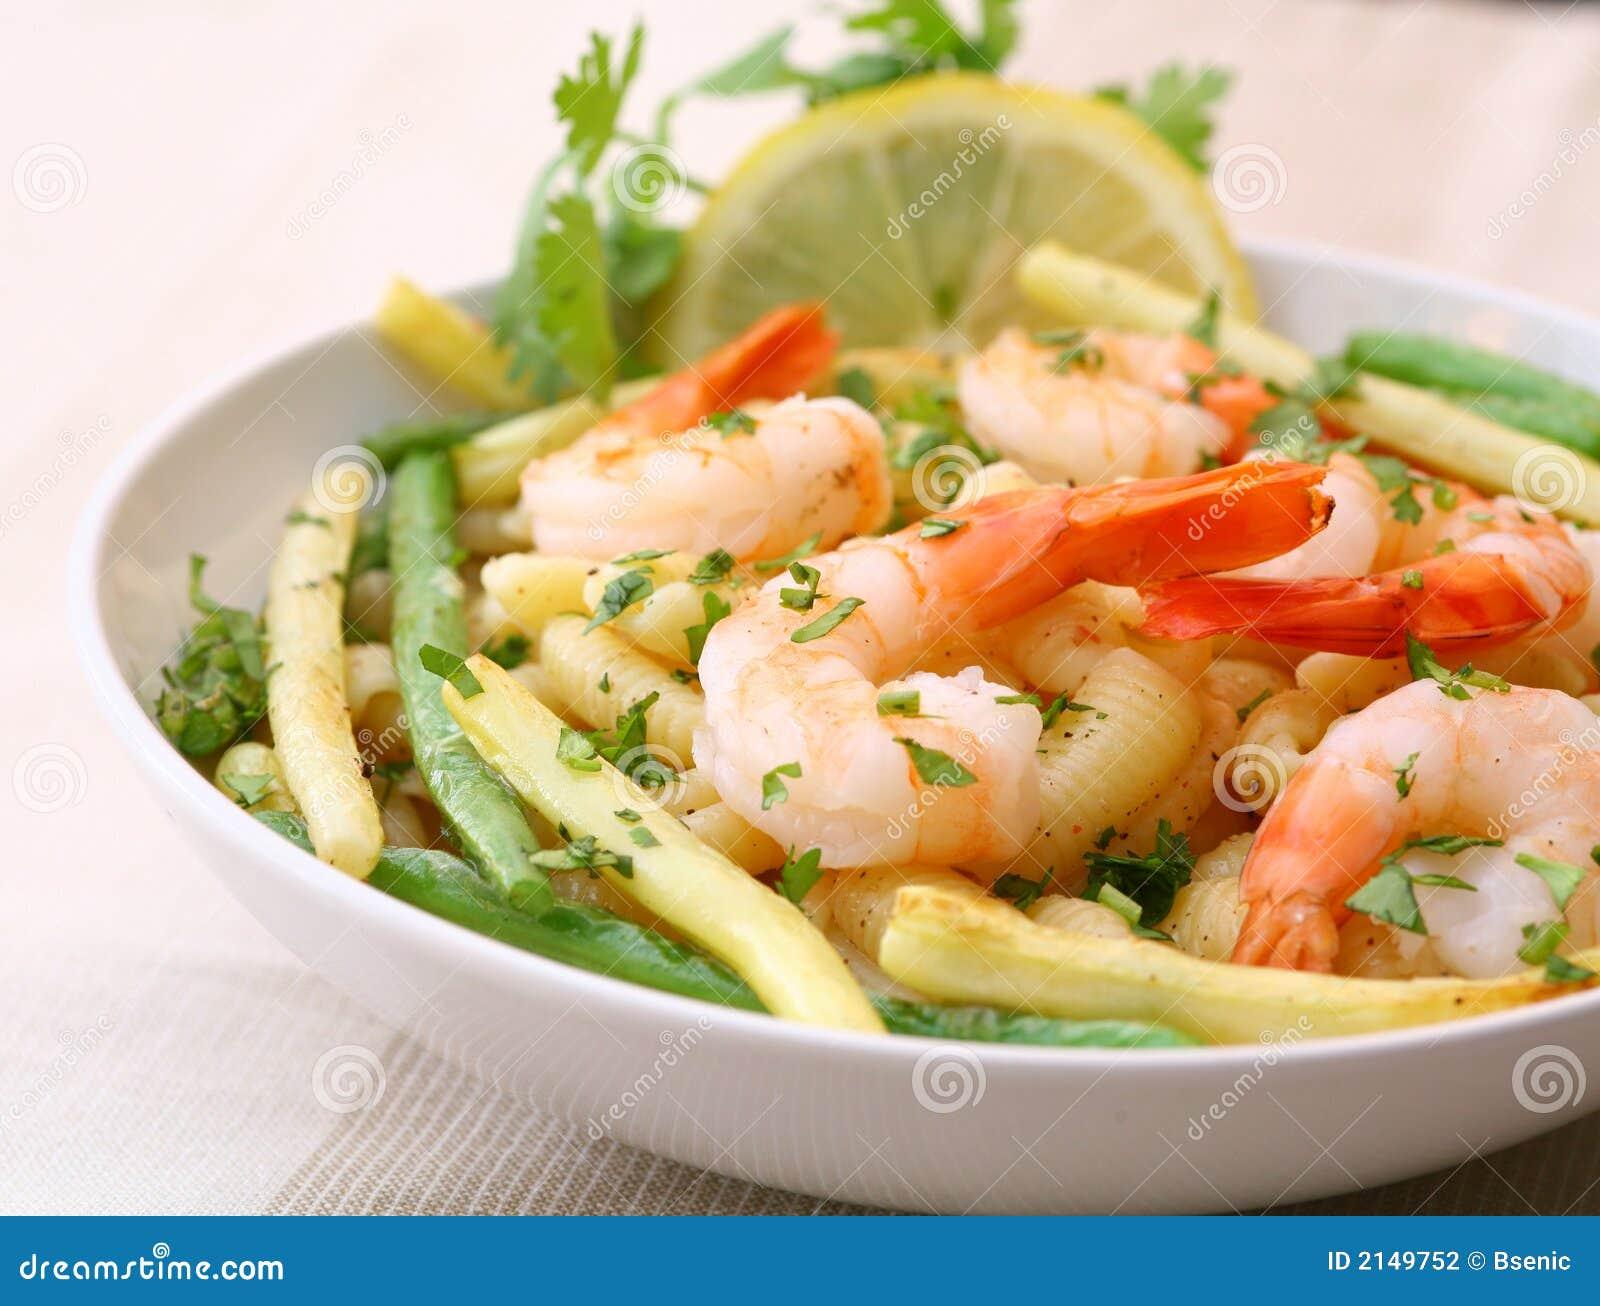 Shrimp Salad Stock Photography - Image: 2149752